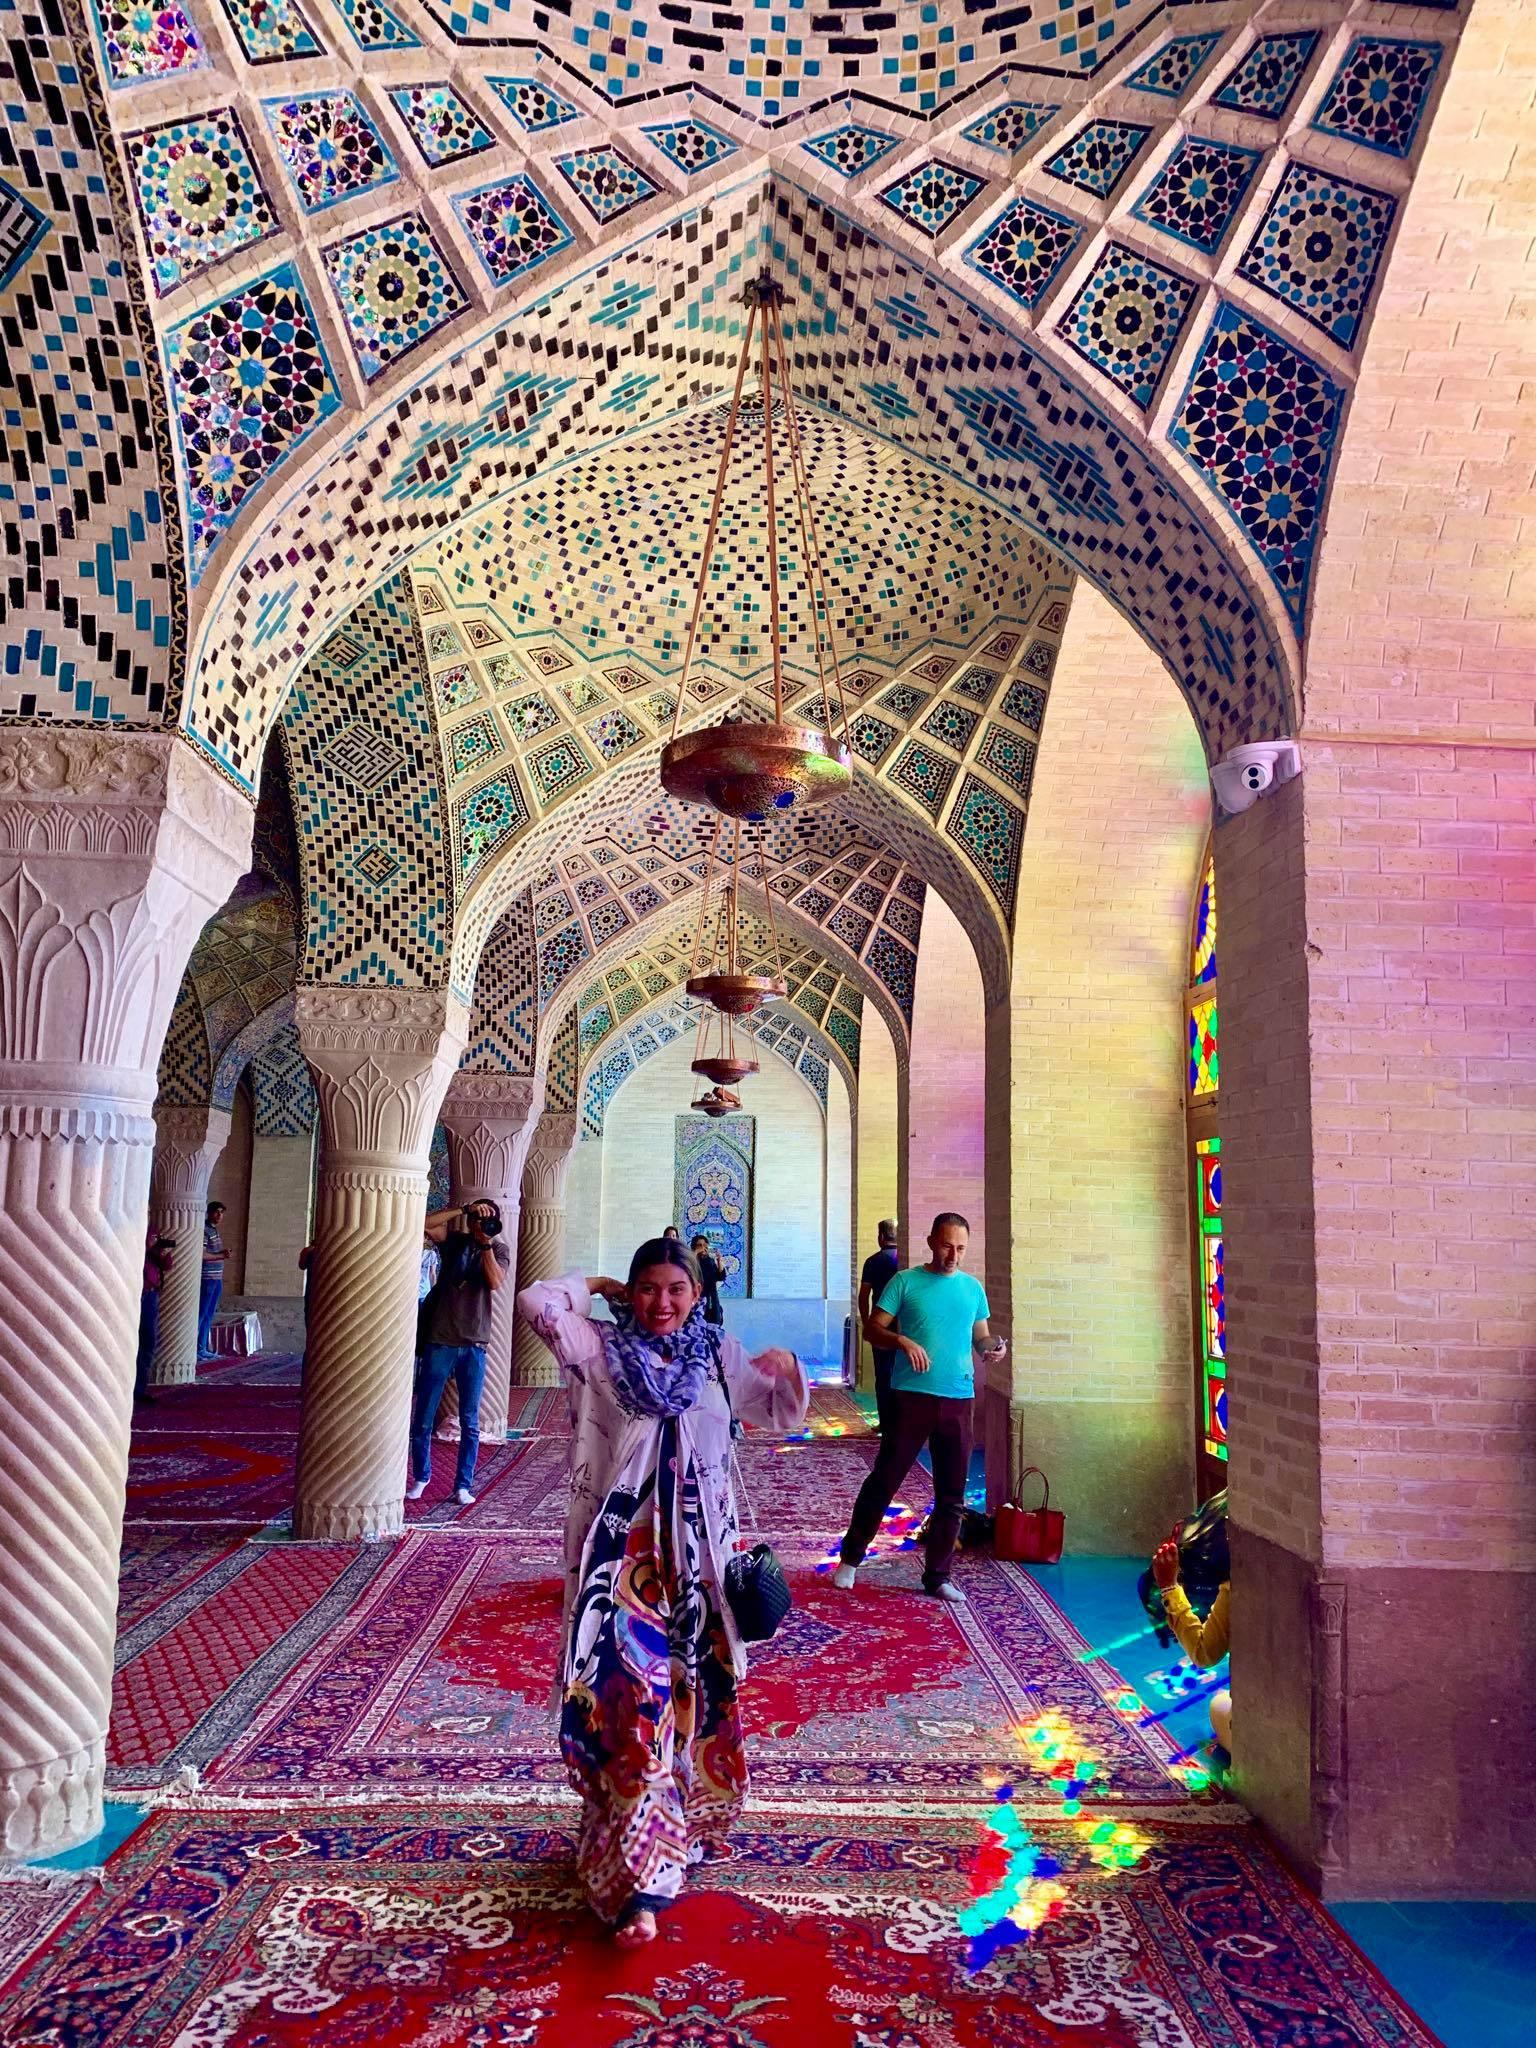 Kach Solo Travels in 2019 Good morning from SHIRAZ, IRAN7.jpg